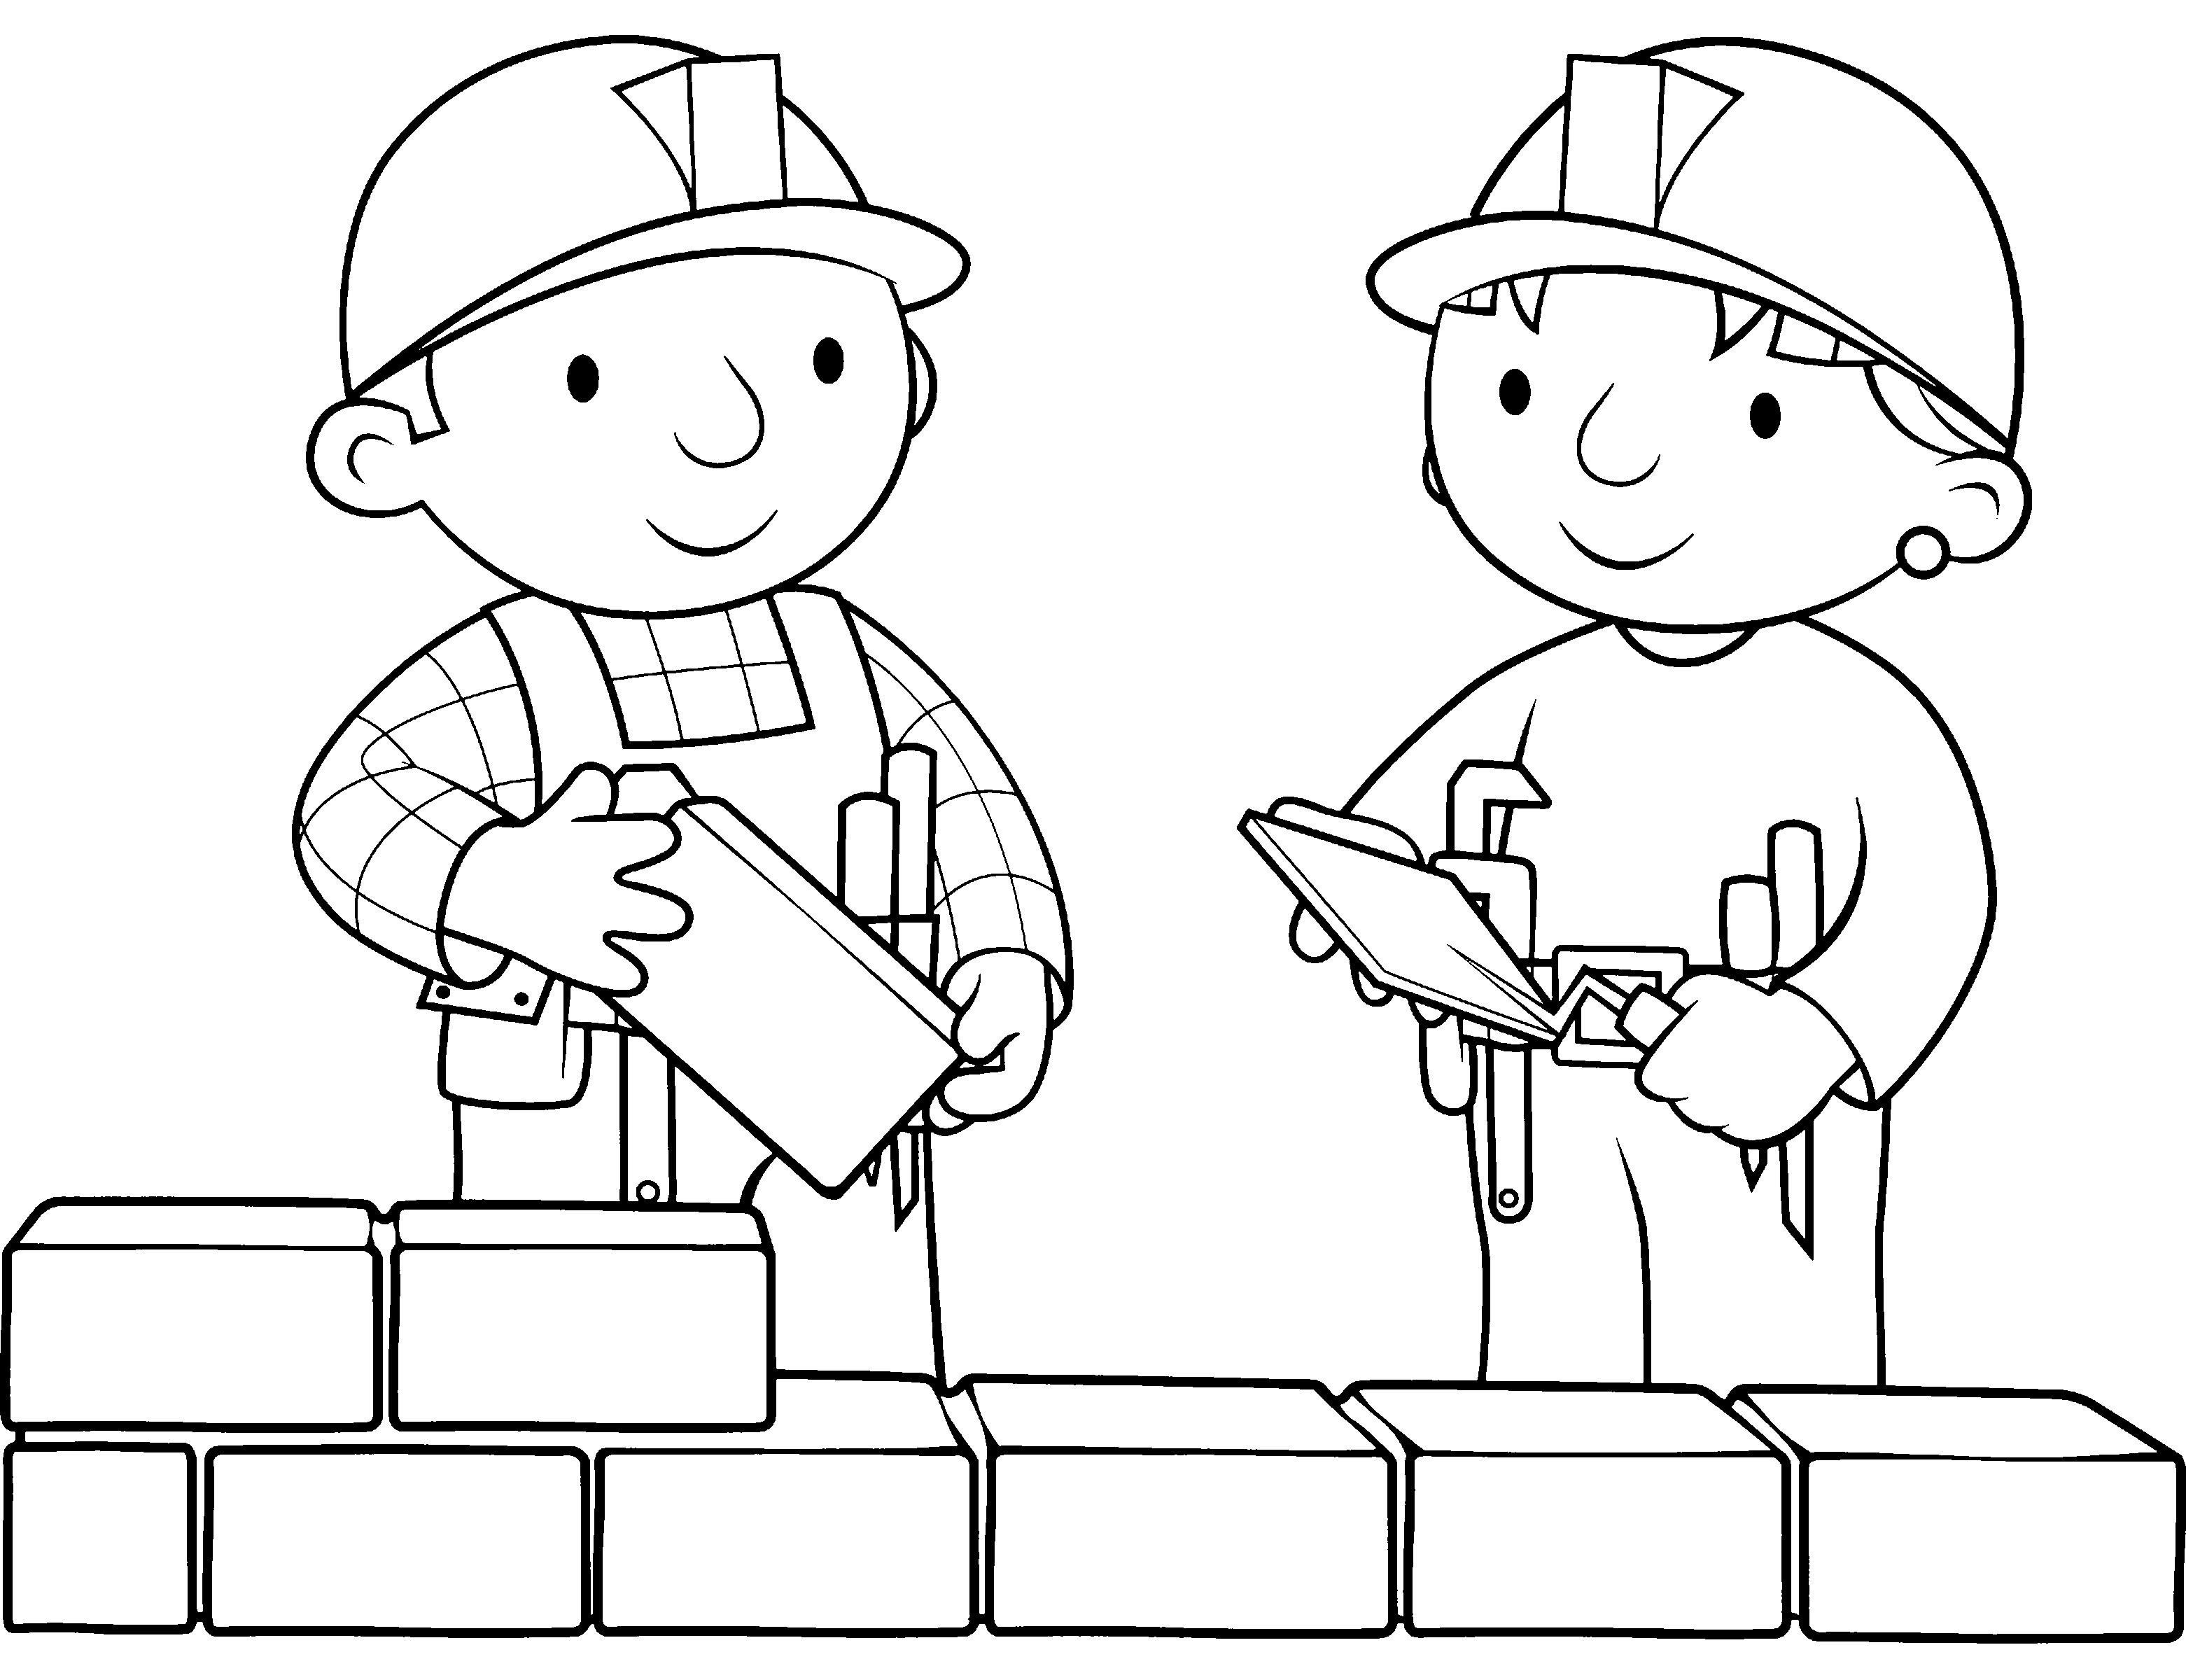 Bob The Builder Coloring Pages - Kidsuki